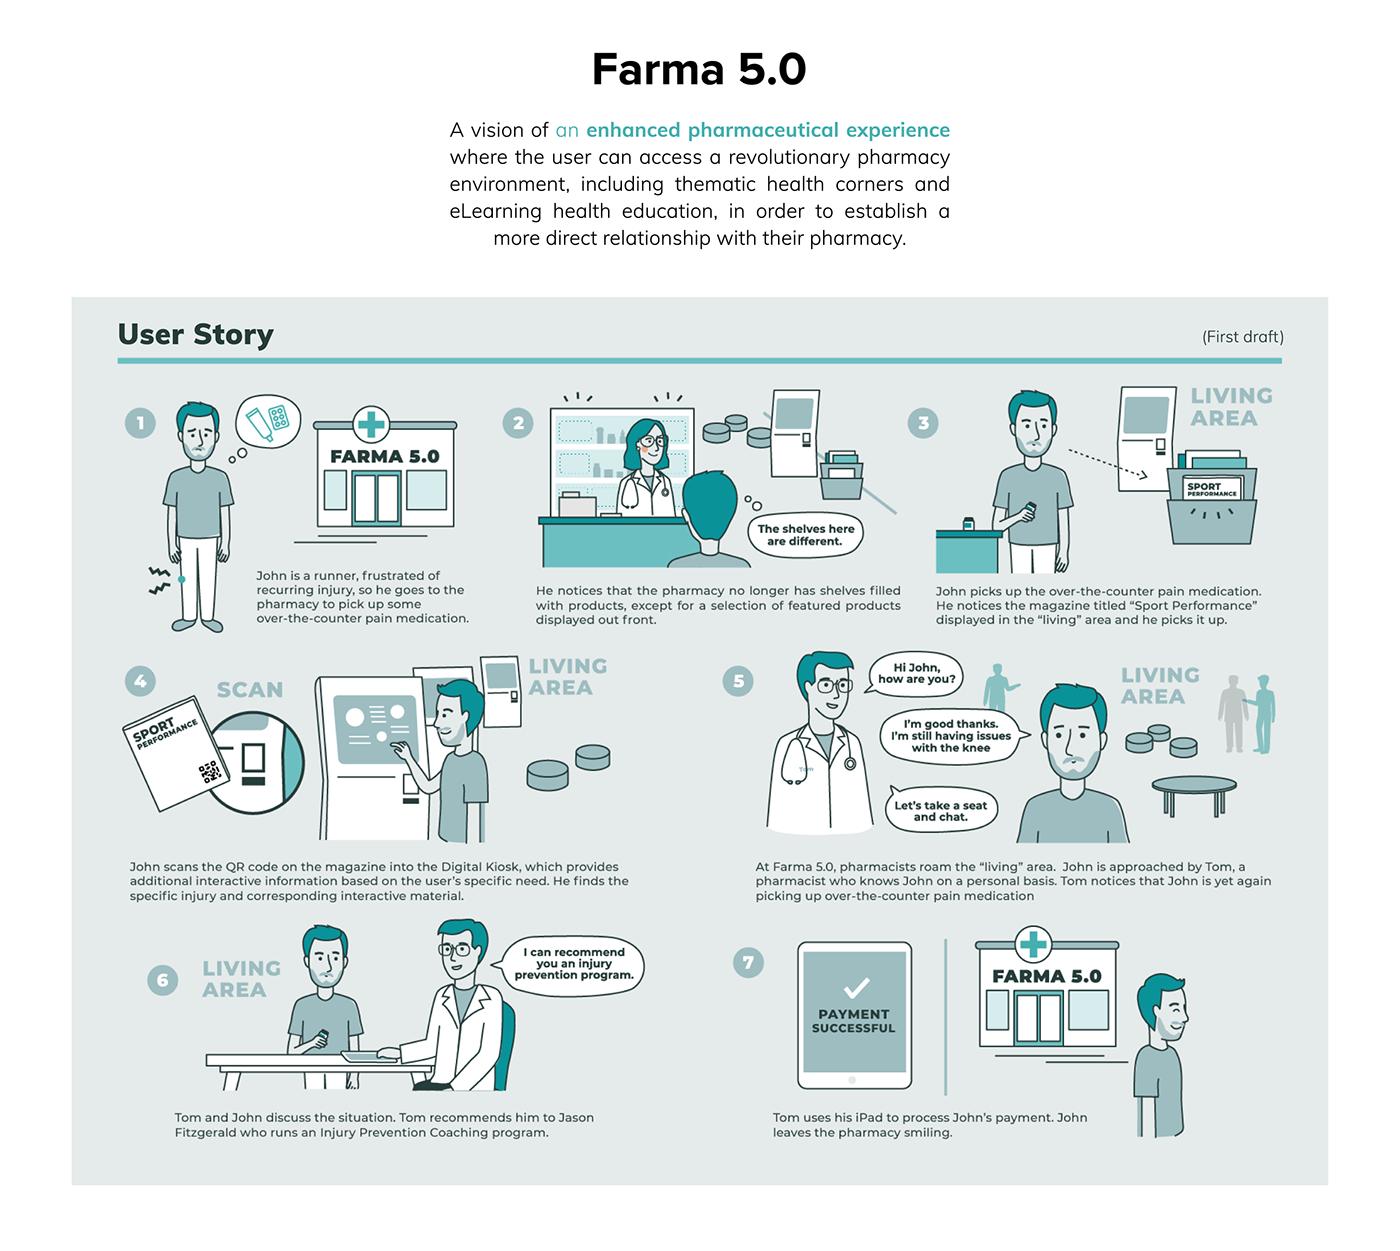 Service design pharmacy future of pharmacy future pharmacist healthcare health center Healthcare service storyboard User stories concept scenario